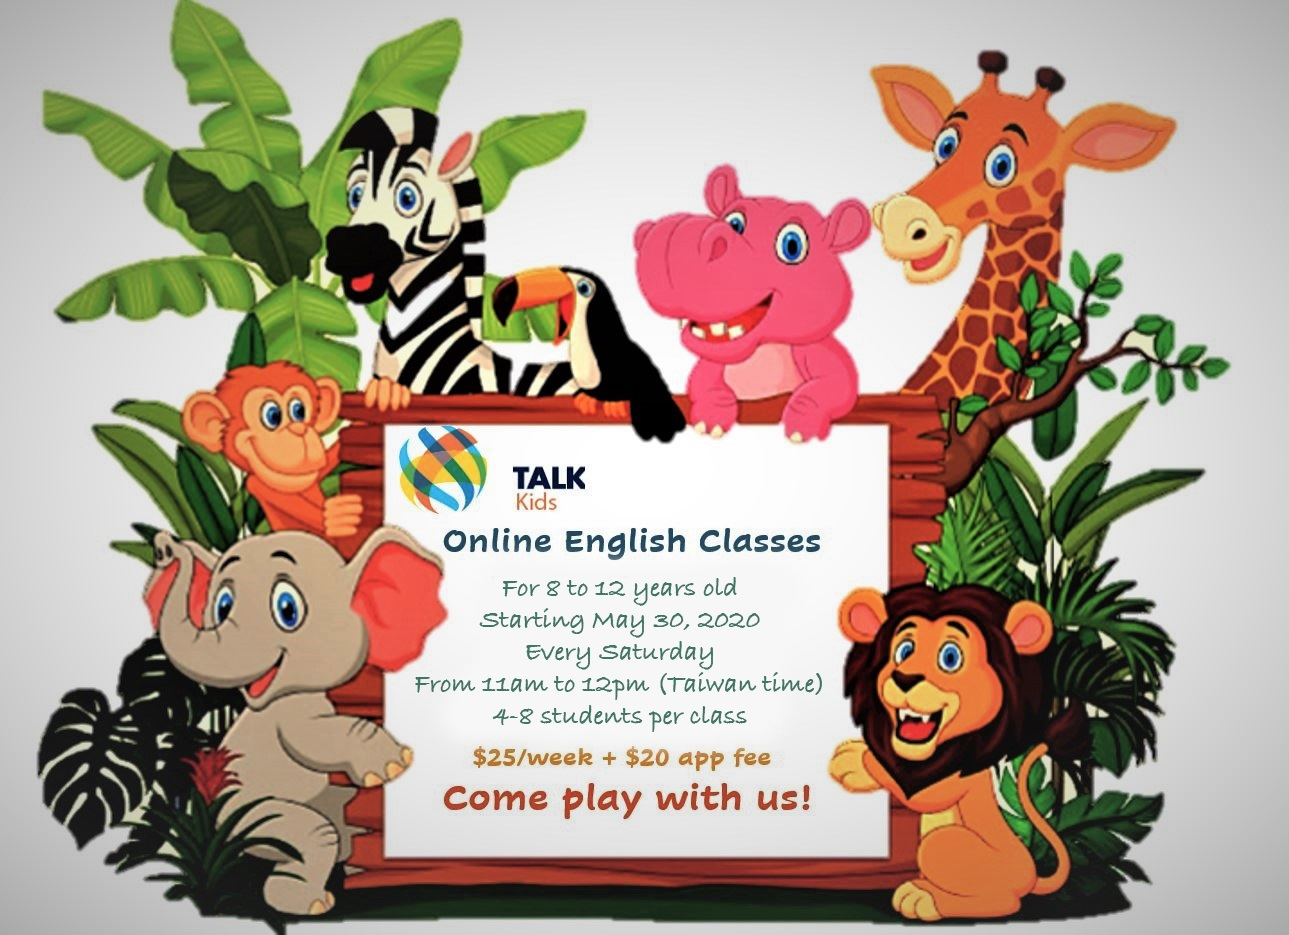 TALK 兒童線上英文課程,專業語言學校純正美國腔老師線上授課中